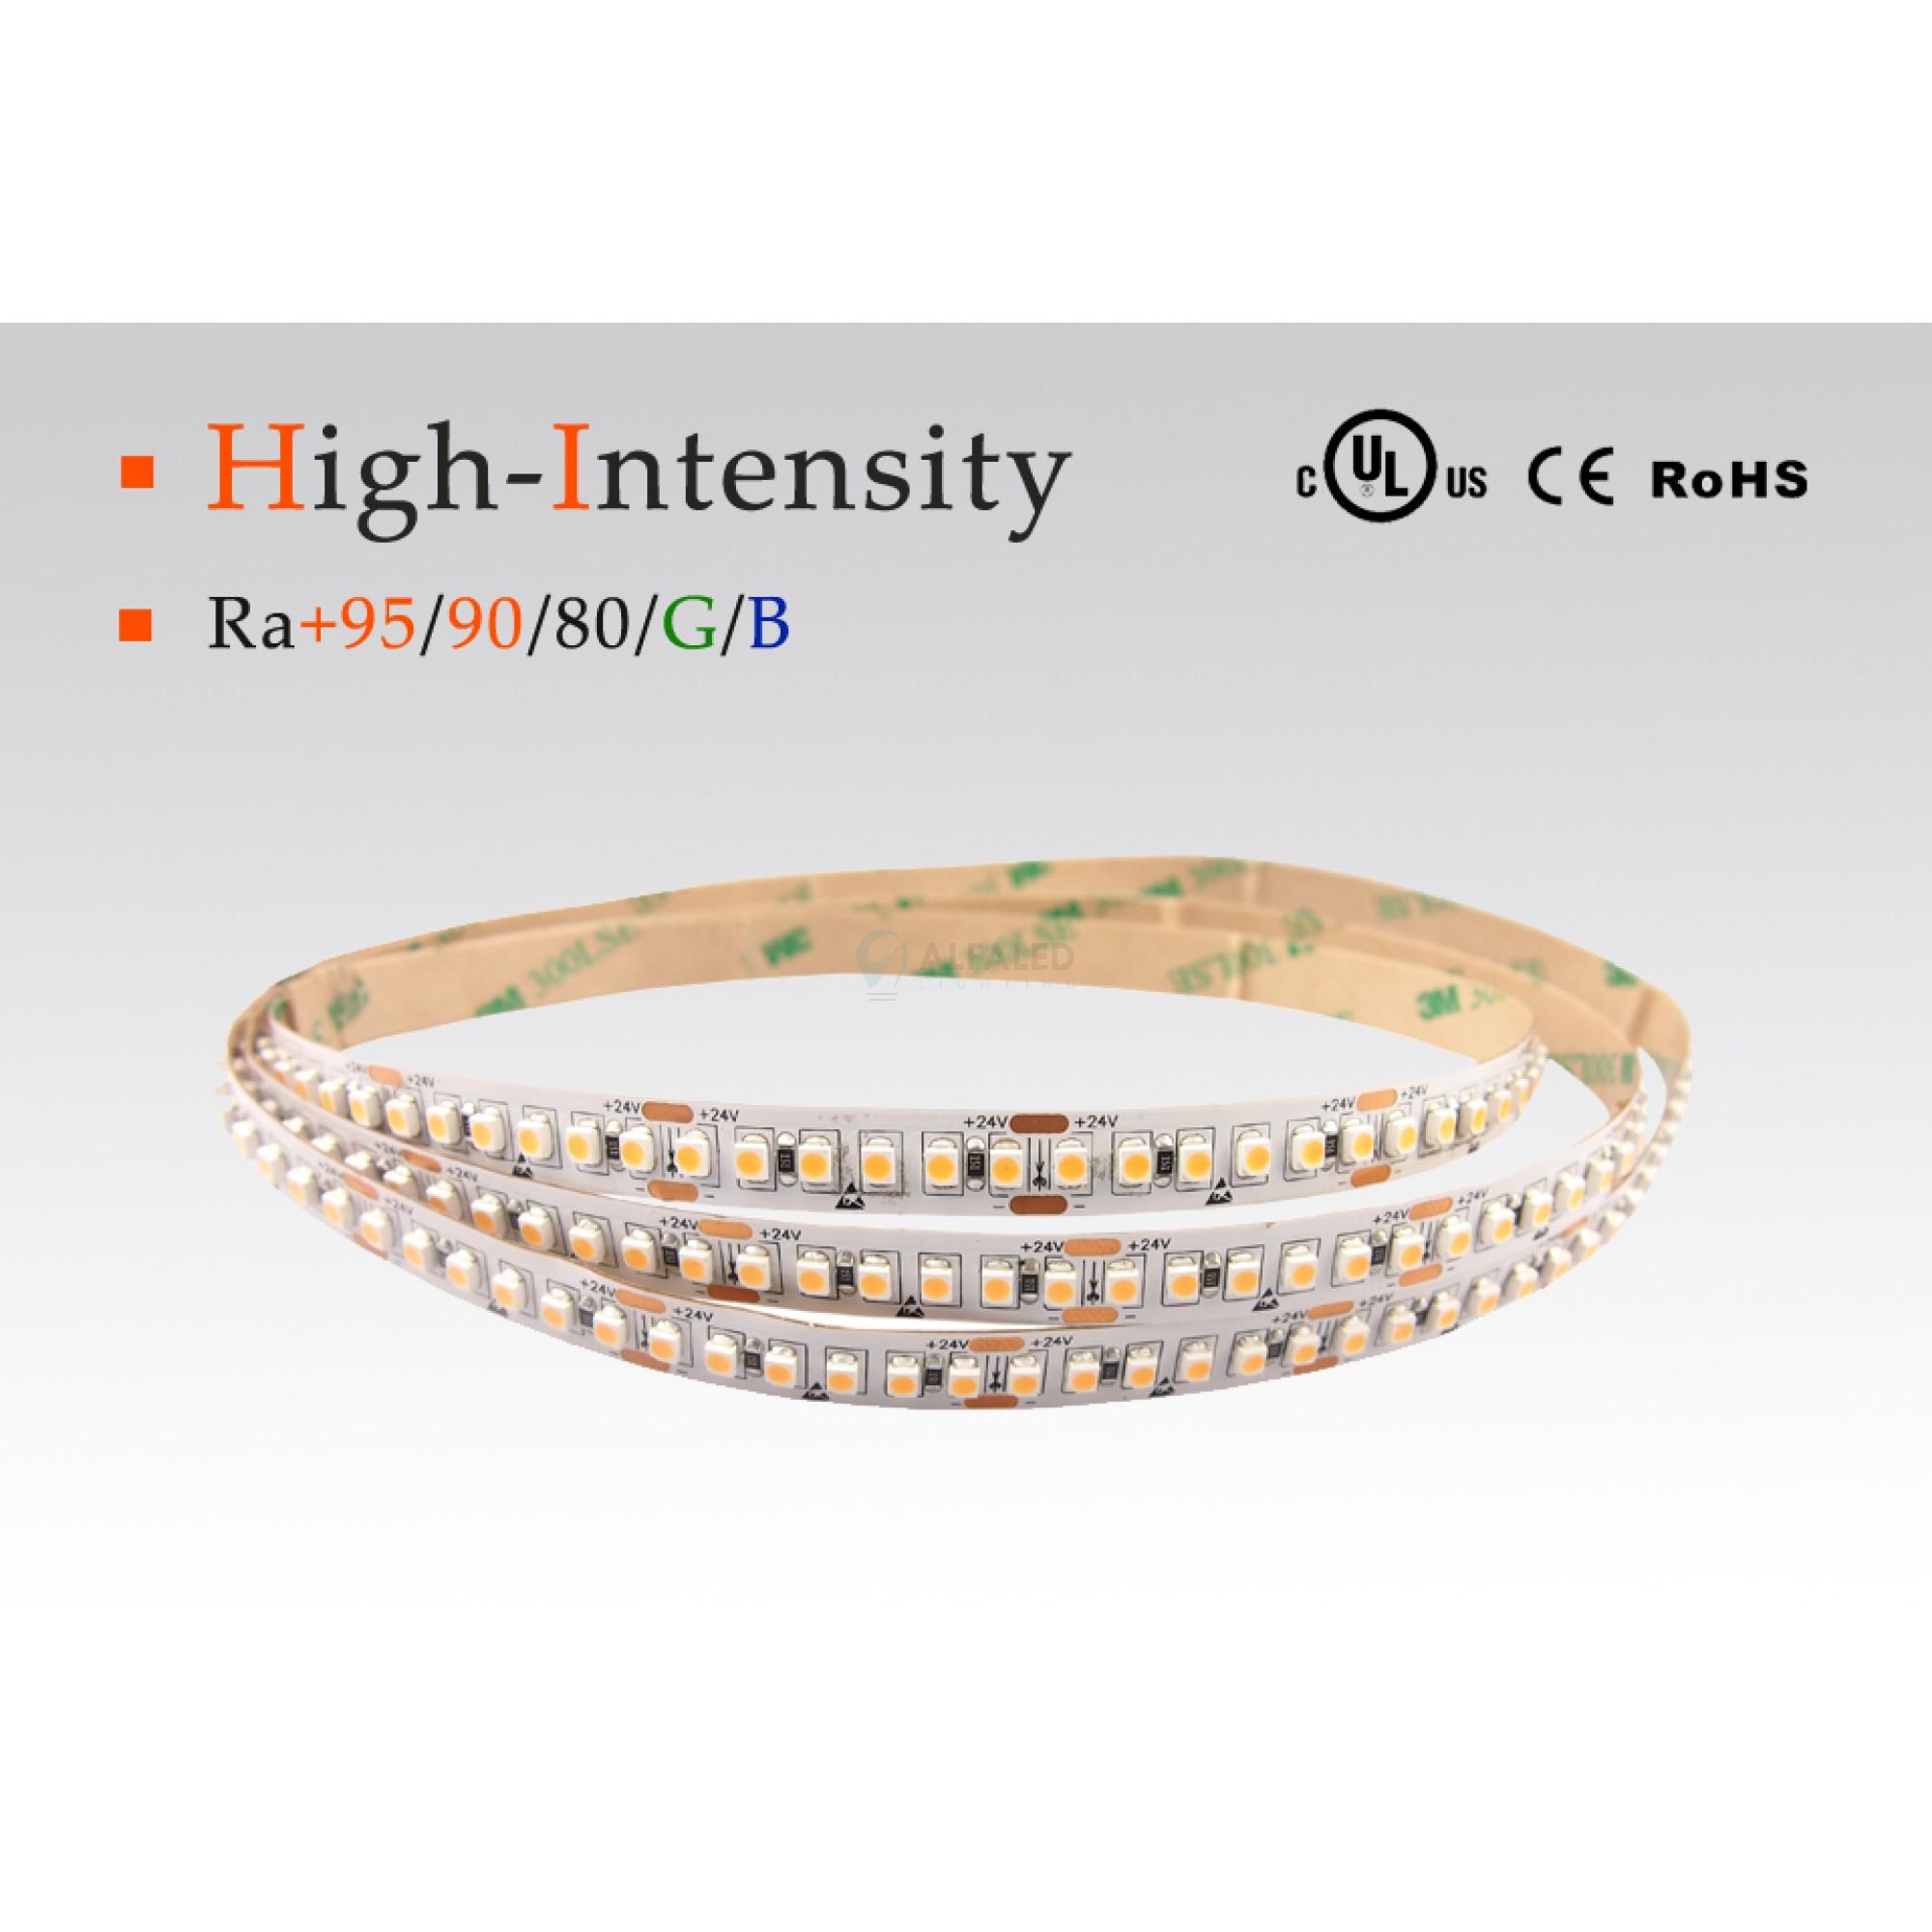 LED pás PREMIUM QUALITY 14,4W/24V High Density 180 LED/m